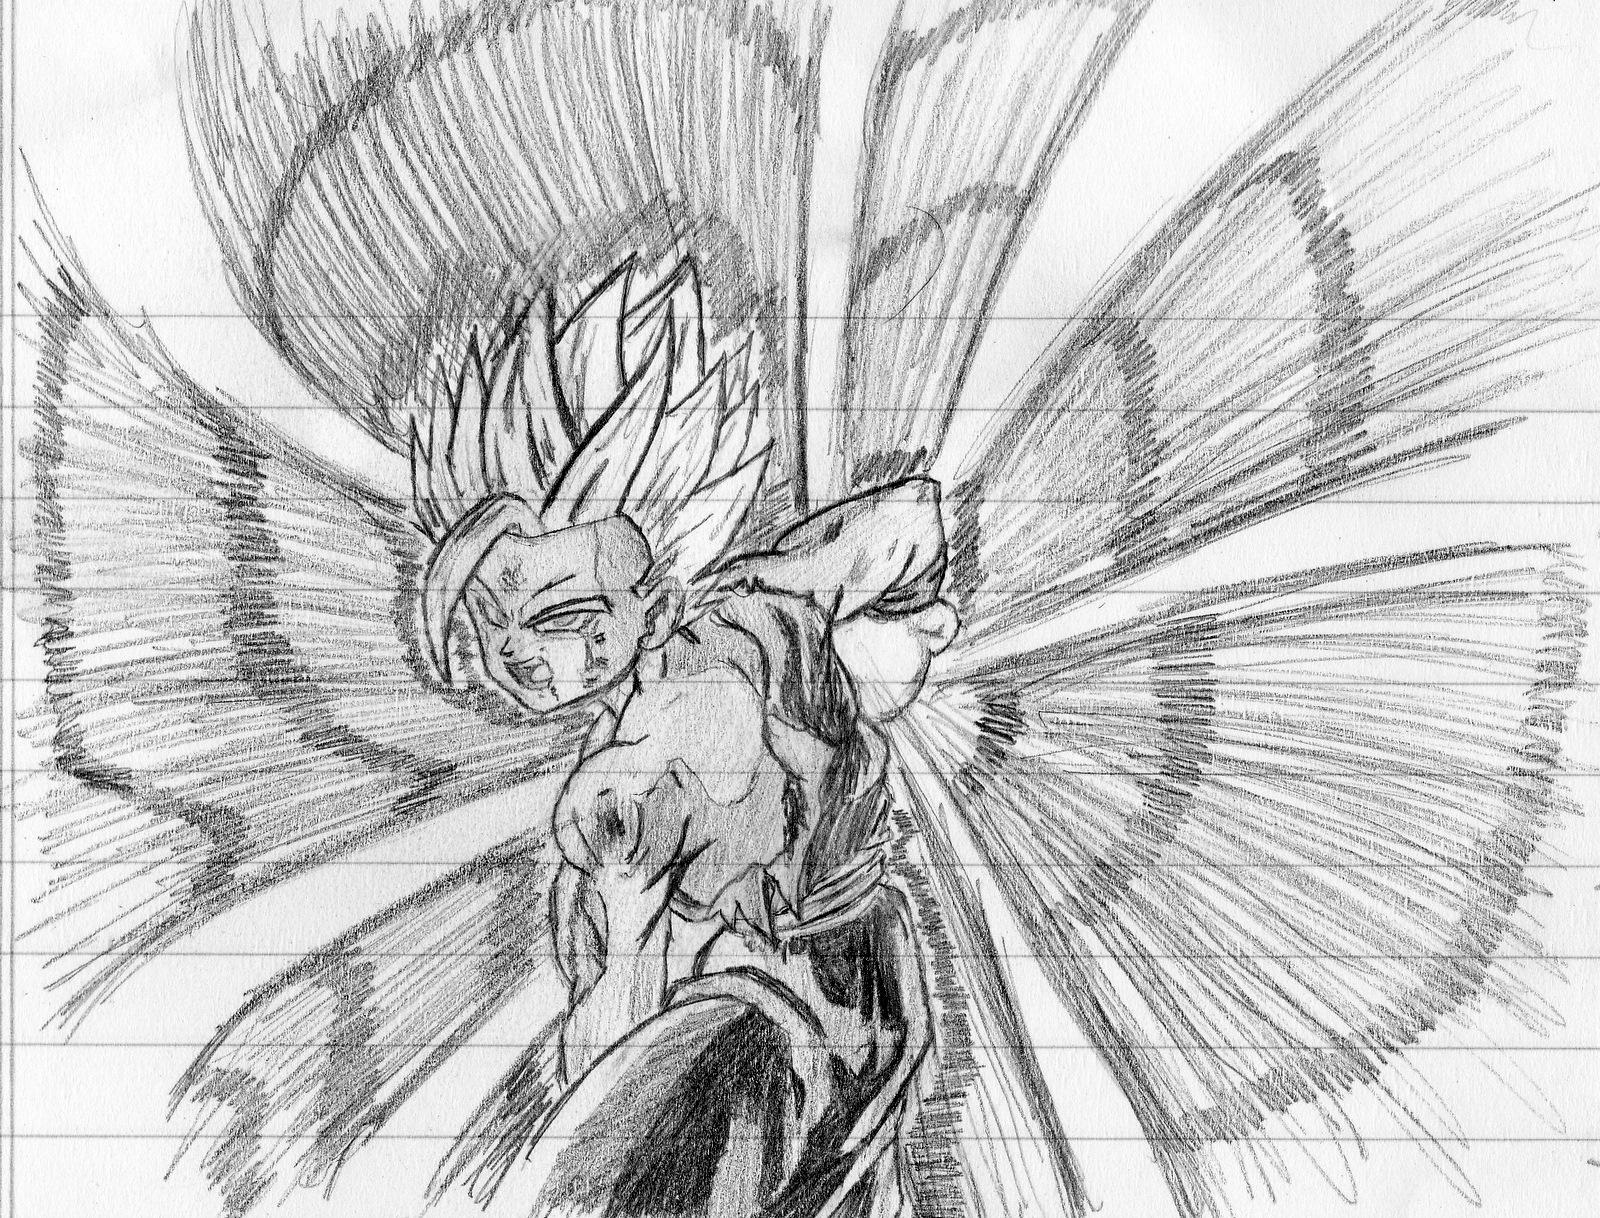 Imagenes De Dragon Ball Z Dibujo A Mano